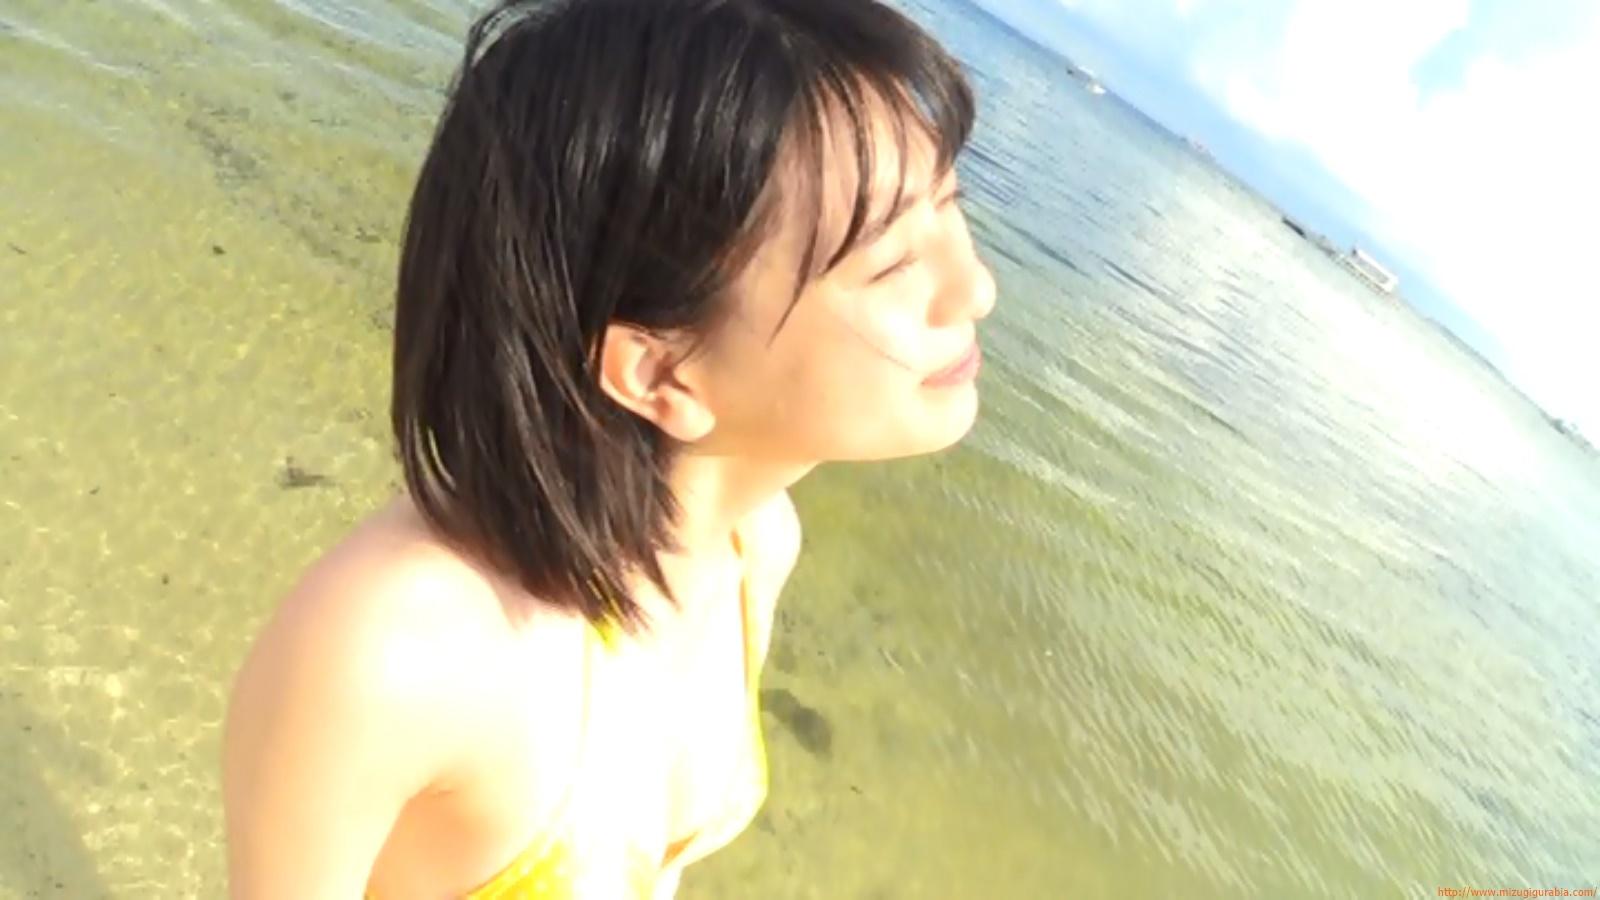 Beach dating358